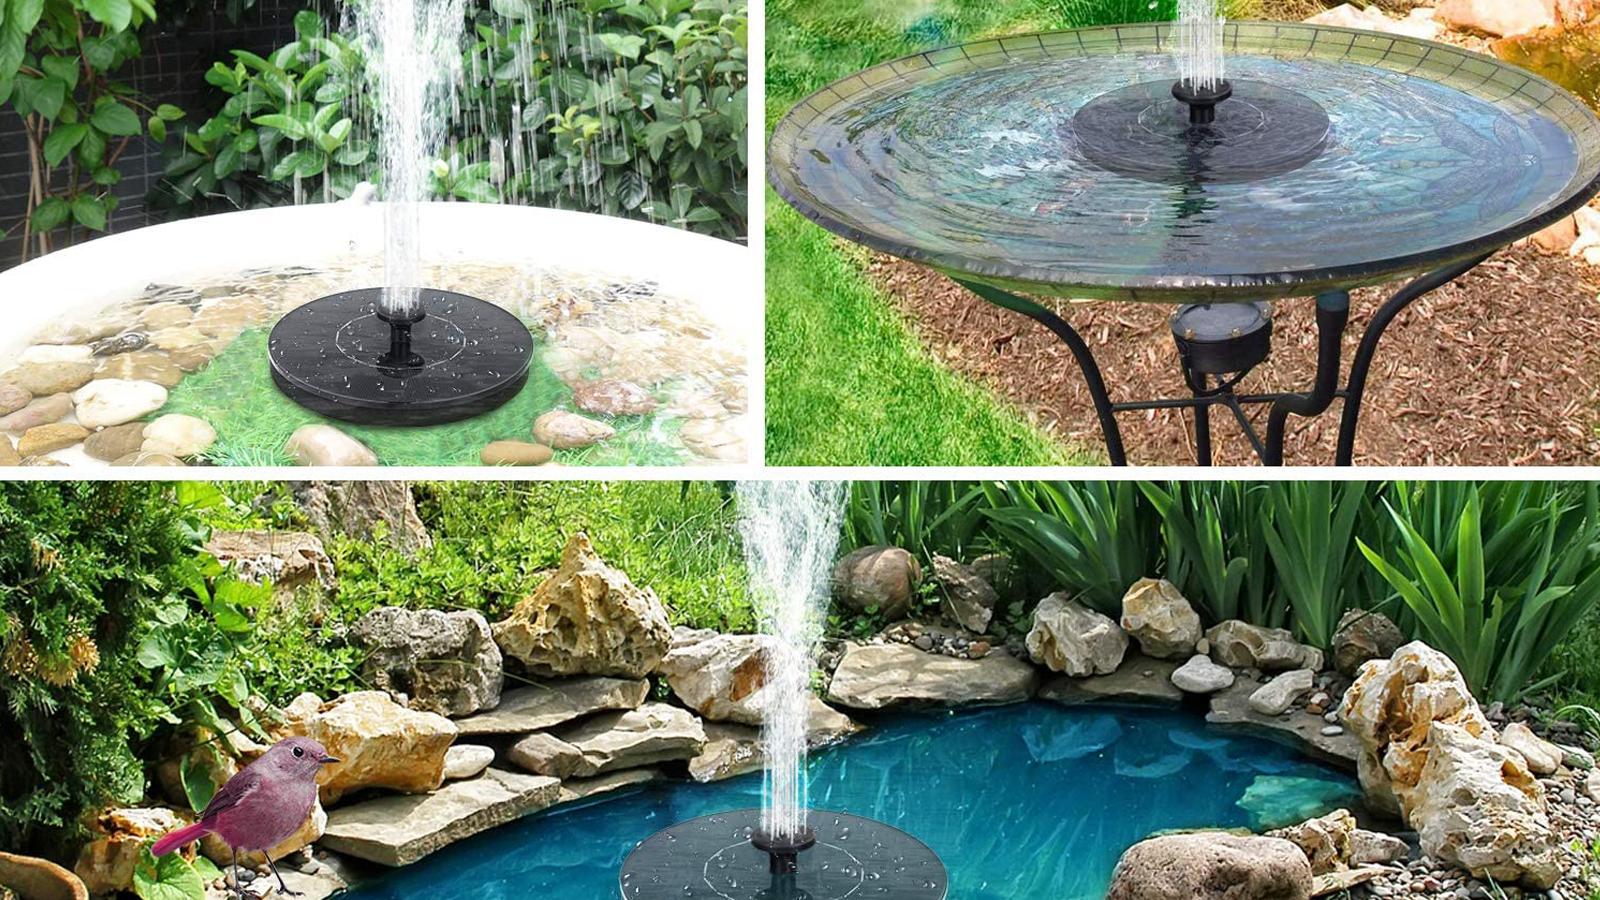 Bring Hummingbirds to Your Yard with This Solar Bird Bath Fountain